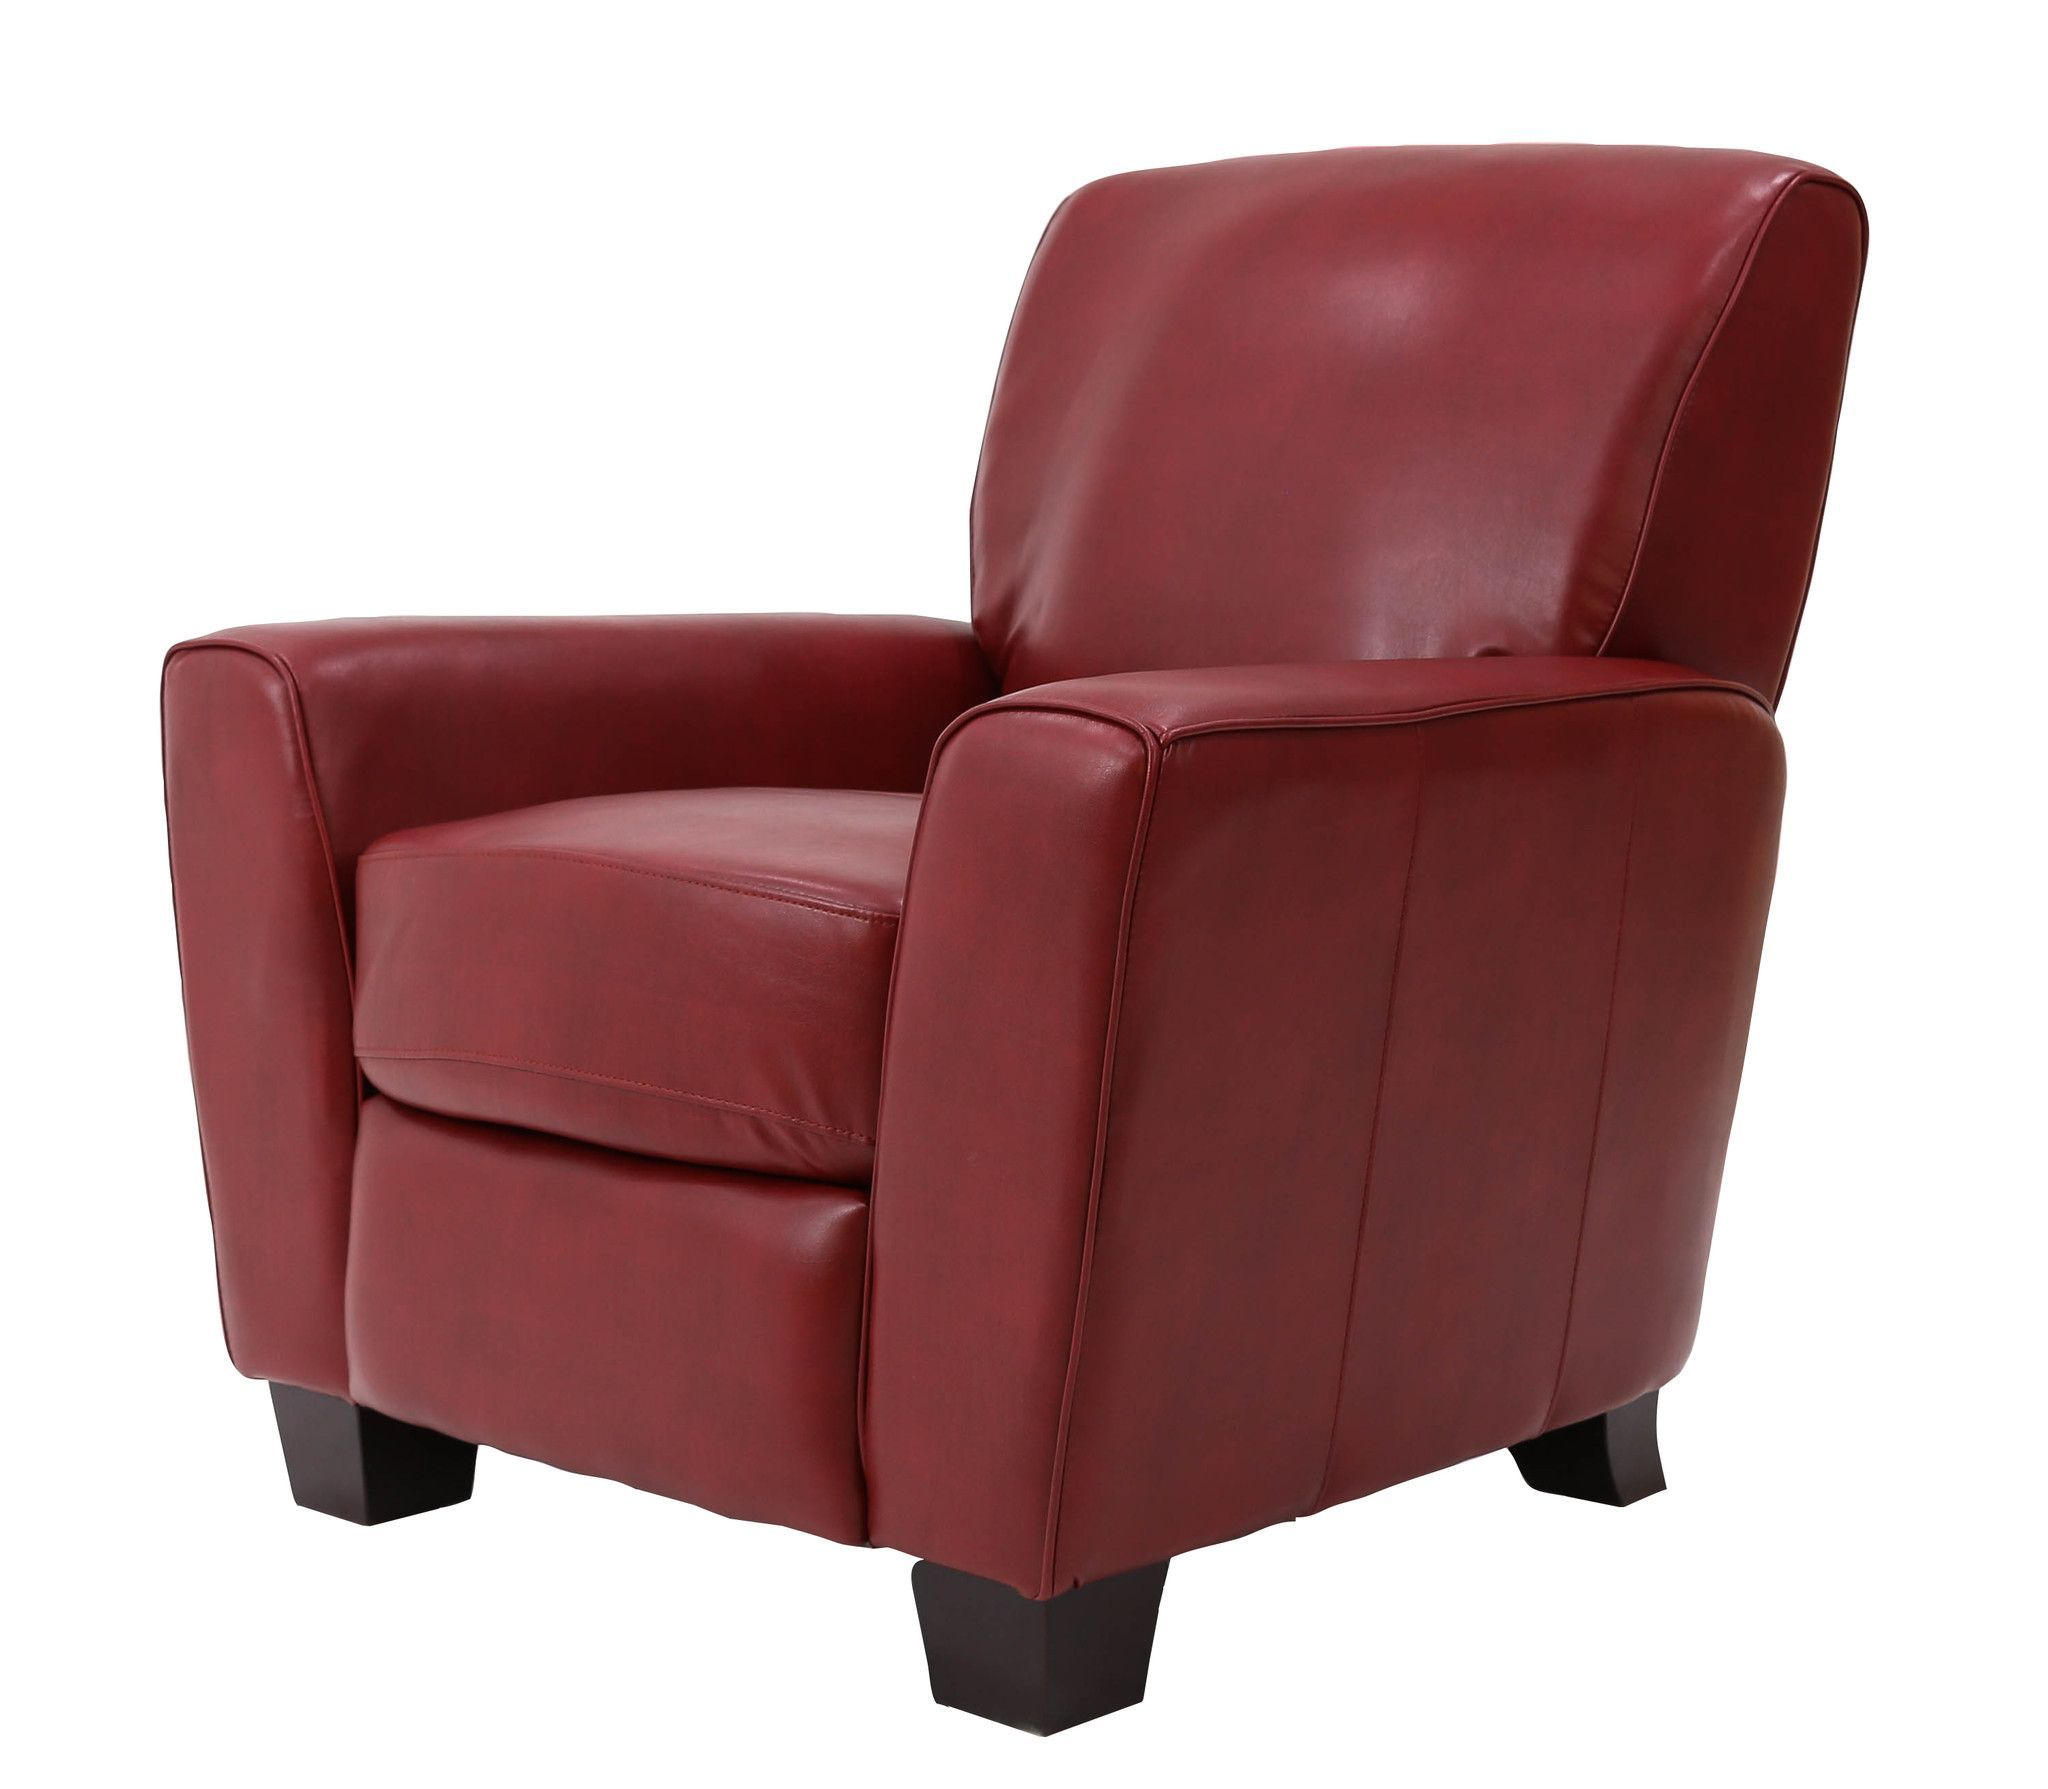 michael anthony furniture nadiana pushback recliner phantom red